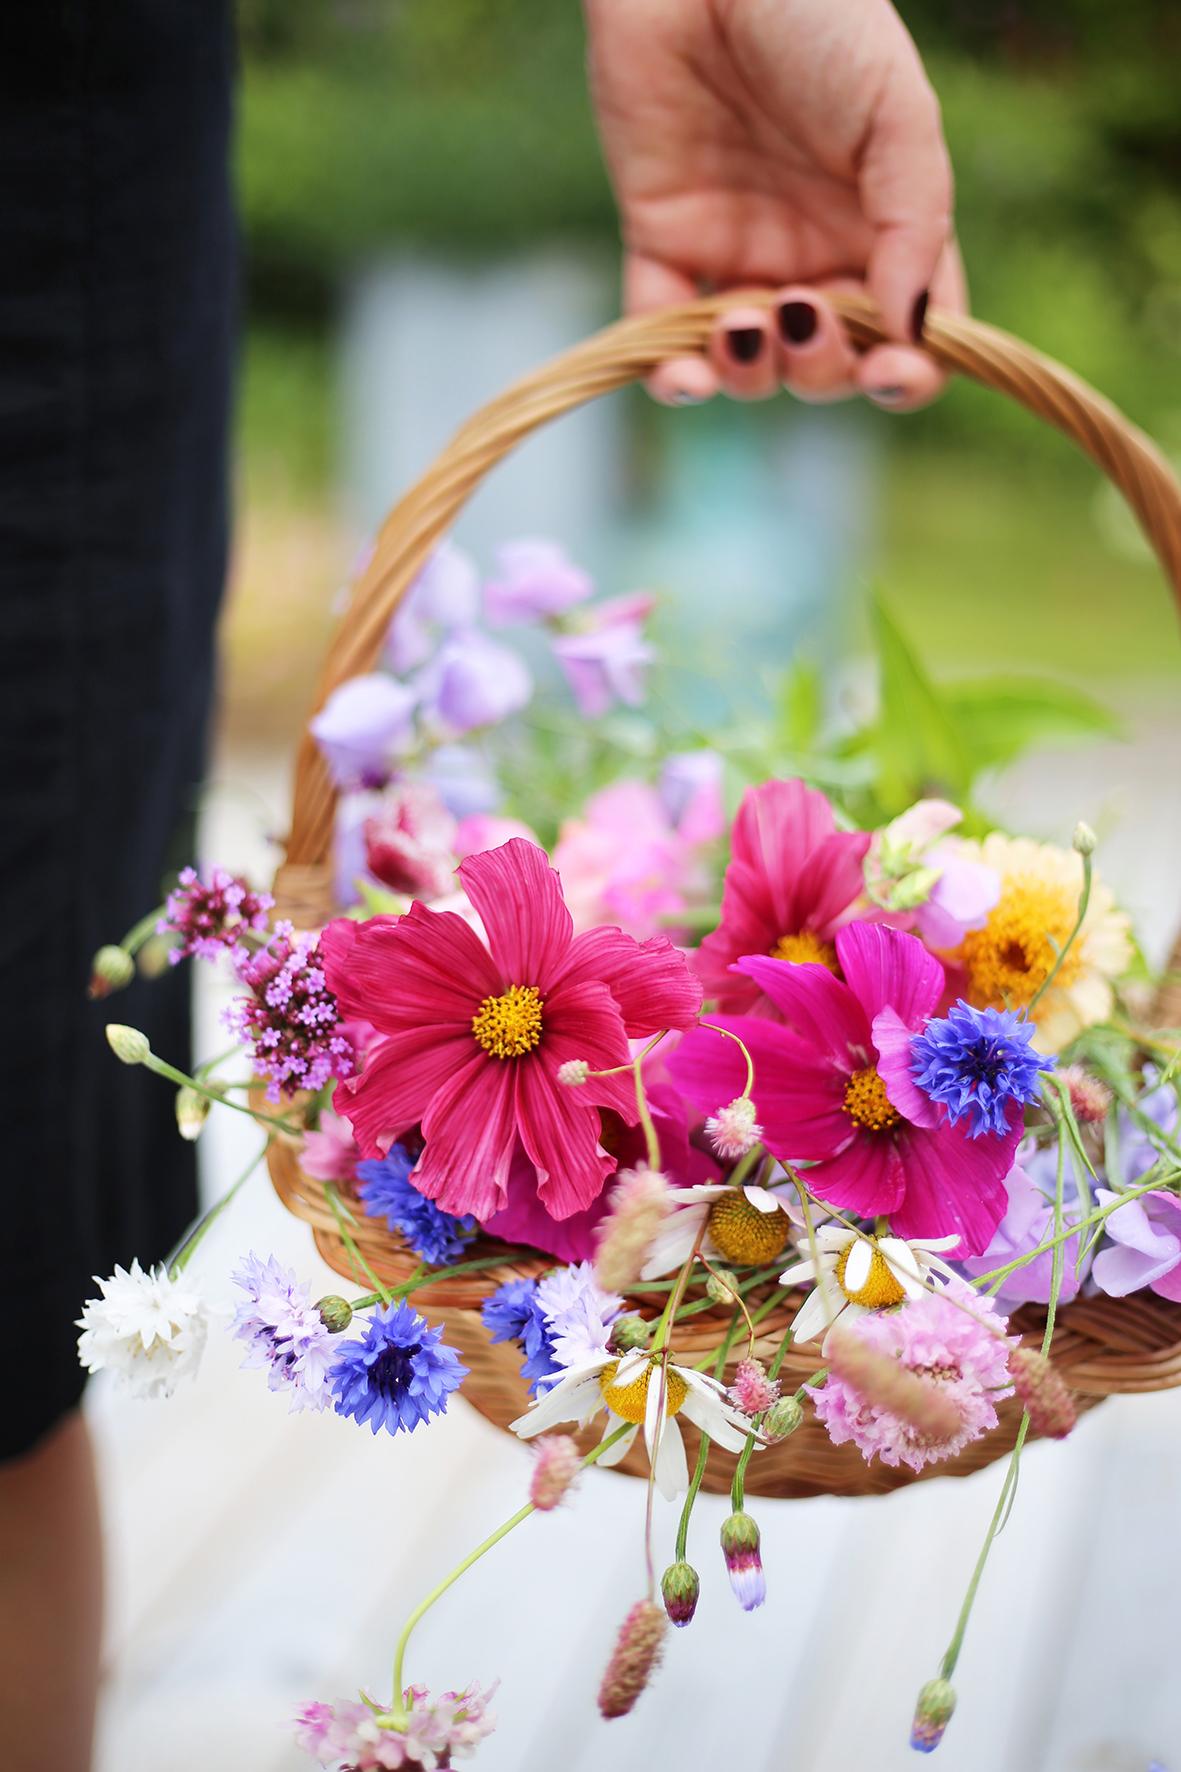 Plocka in blommor varje dag.